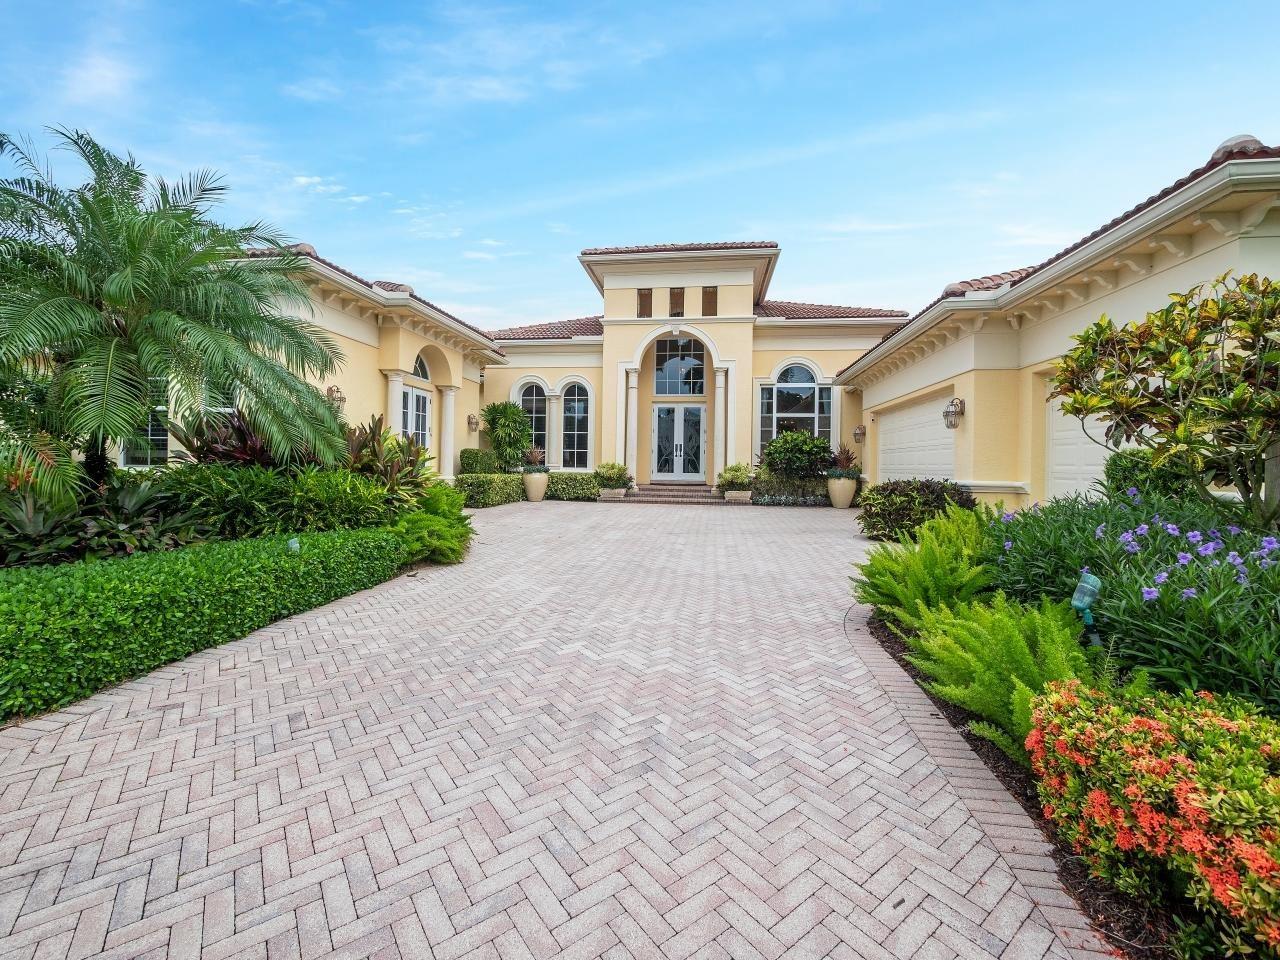 Photo of 120 Grand Palm Way, Palm Beach Gardens, FL 33418 (MLS # RX-10735066)